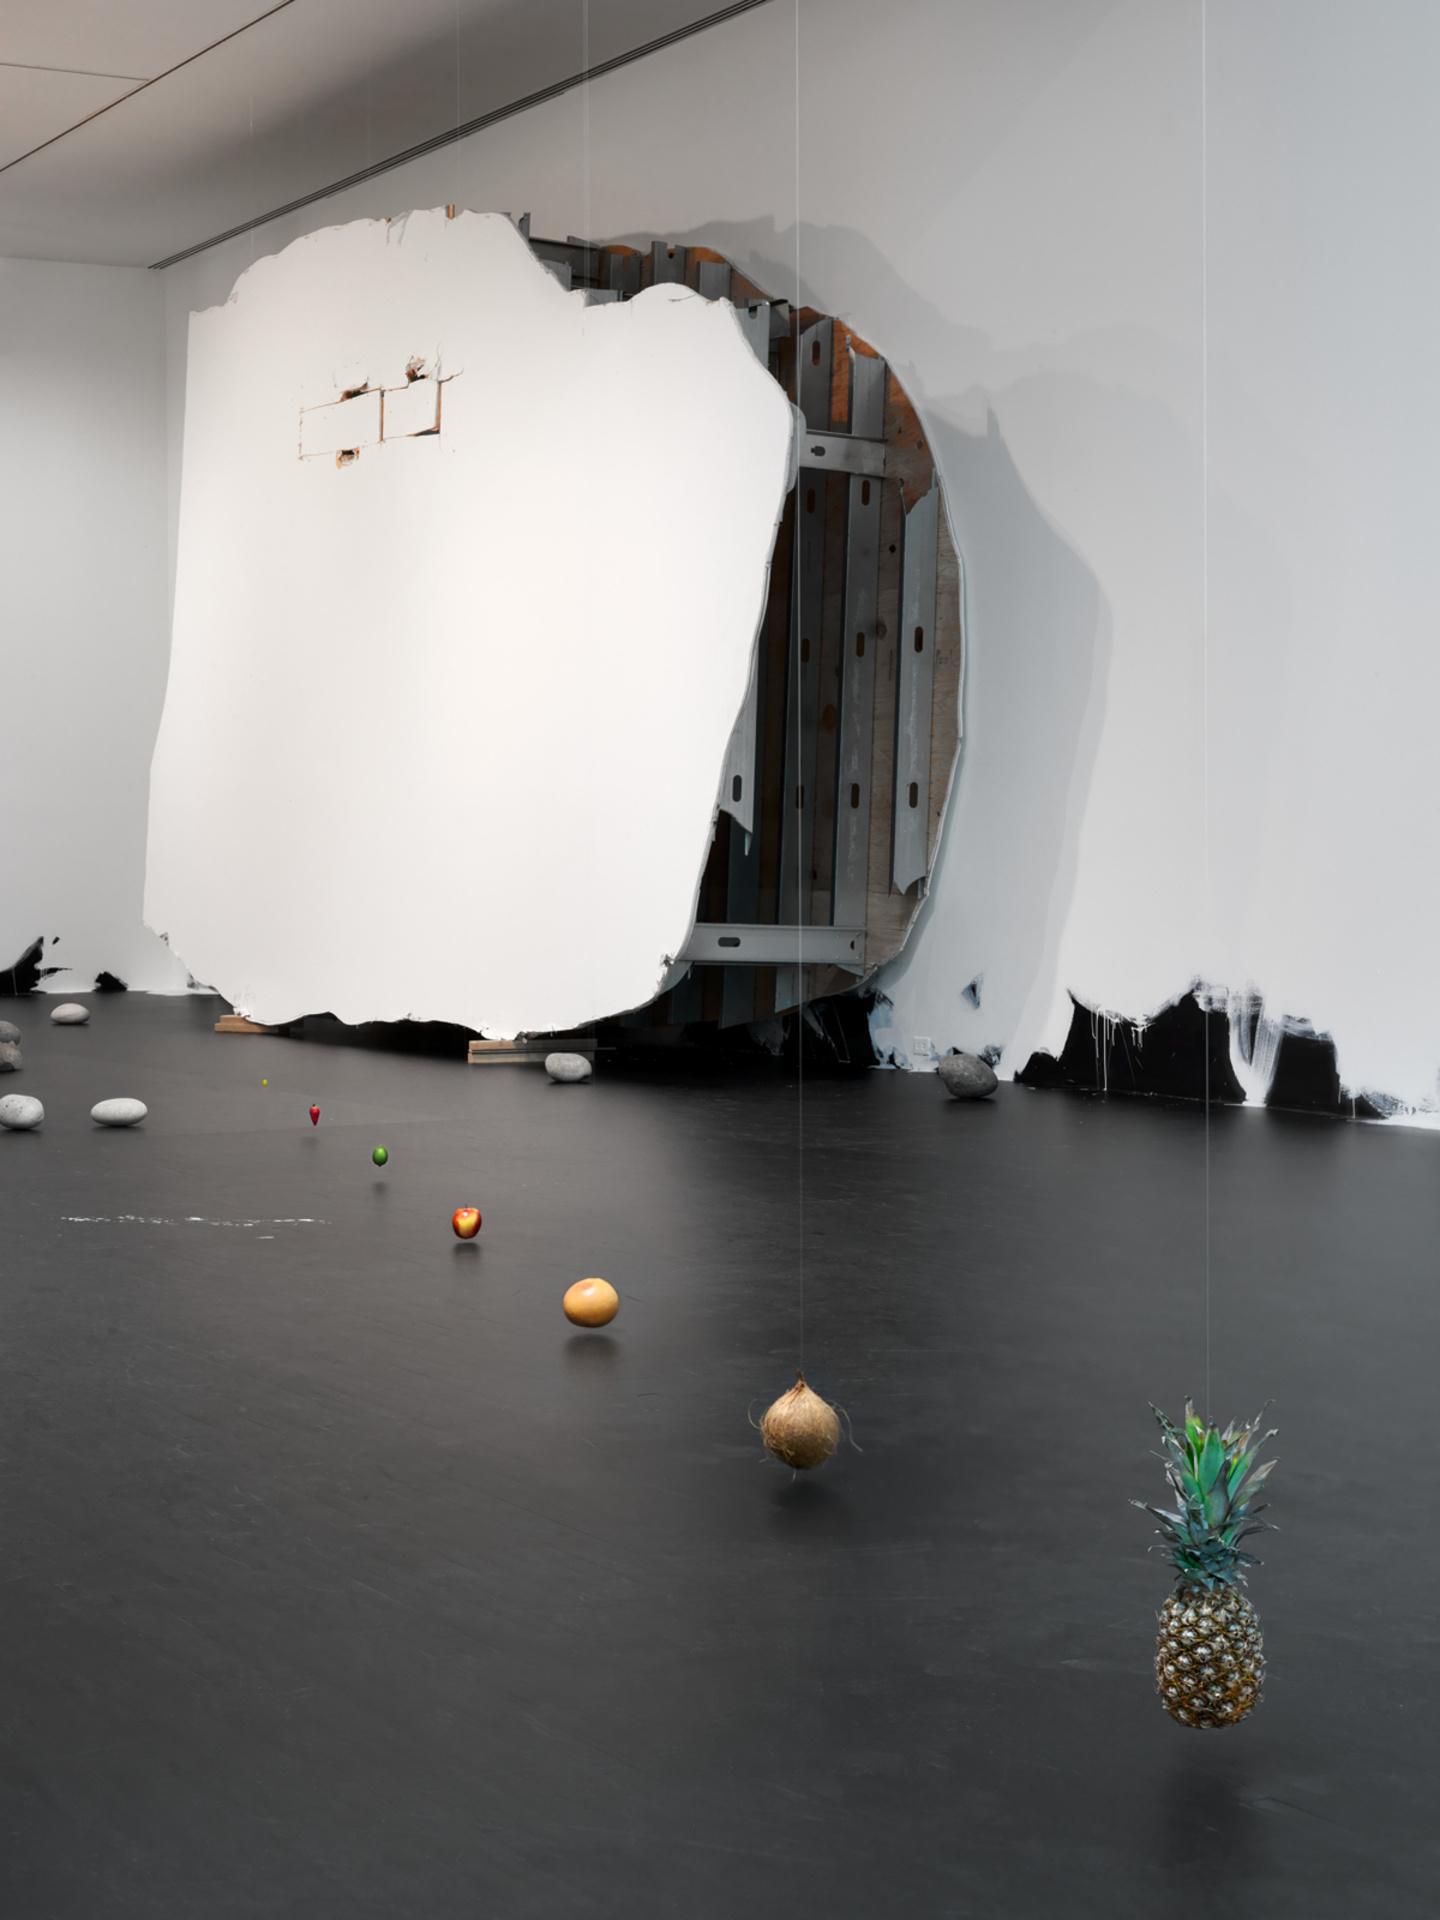 Untitled (Suspended Line of Fruit); Untitled (50 Rocks); Portrait of a Single Raindrop; Untitled (Floor Piece)